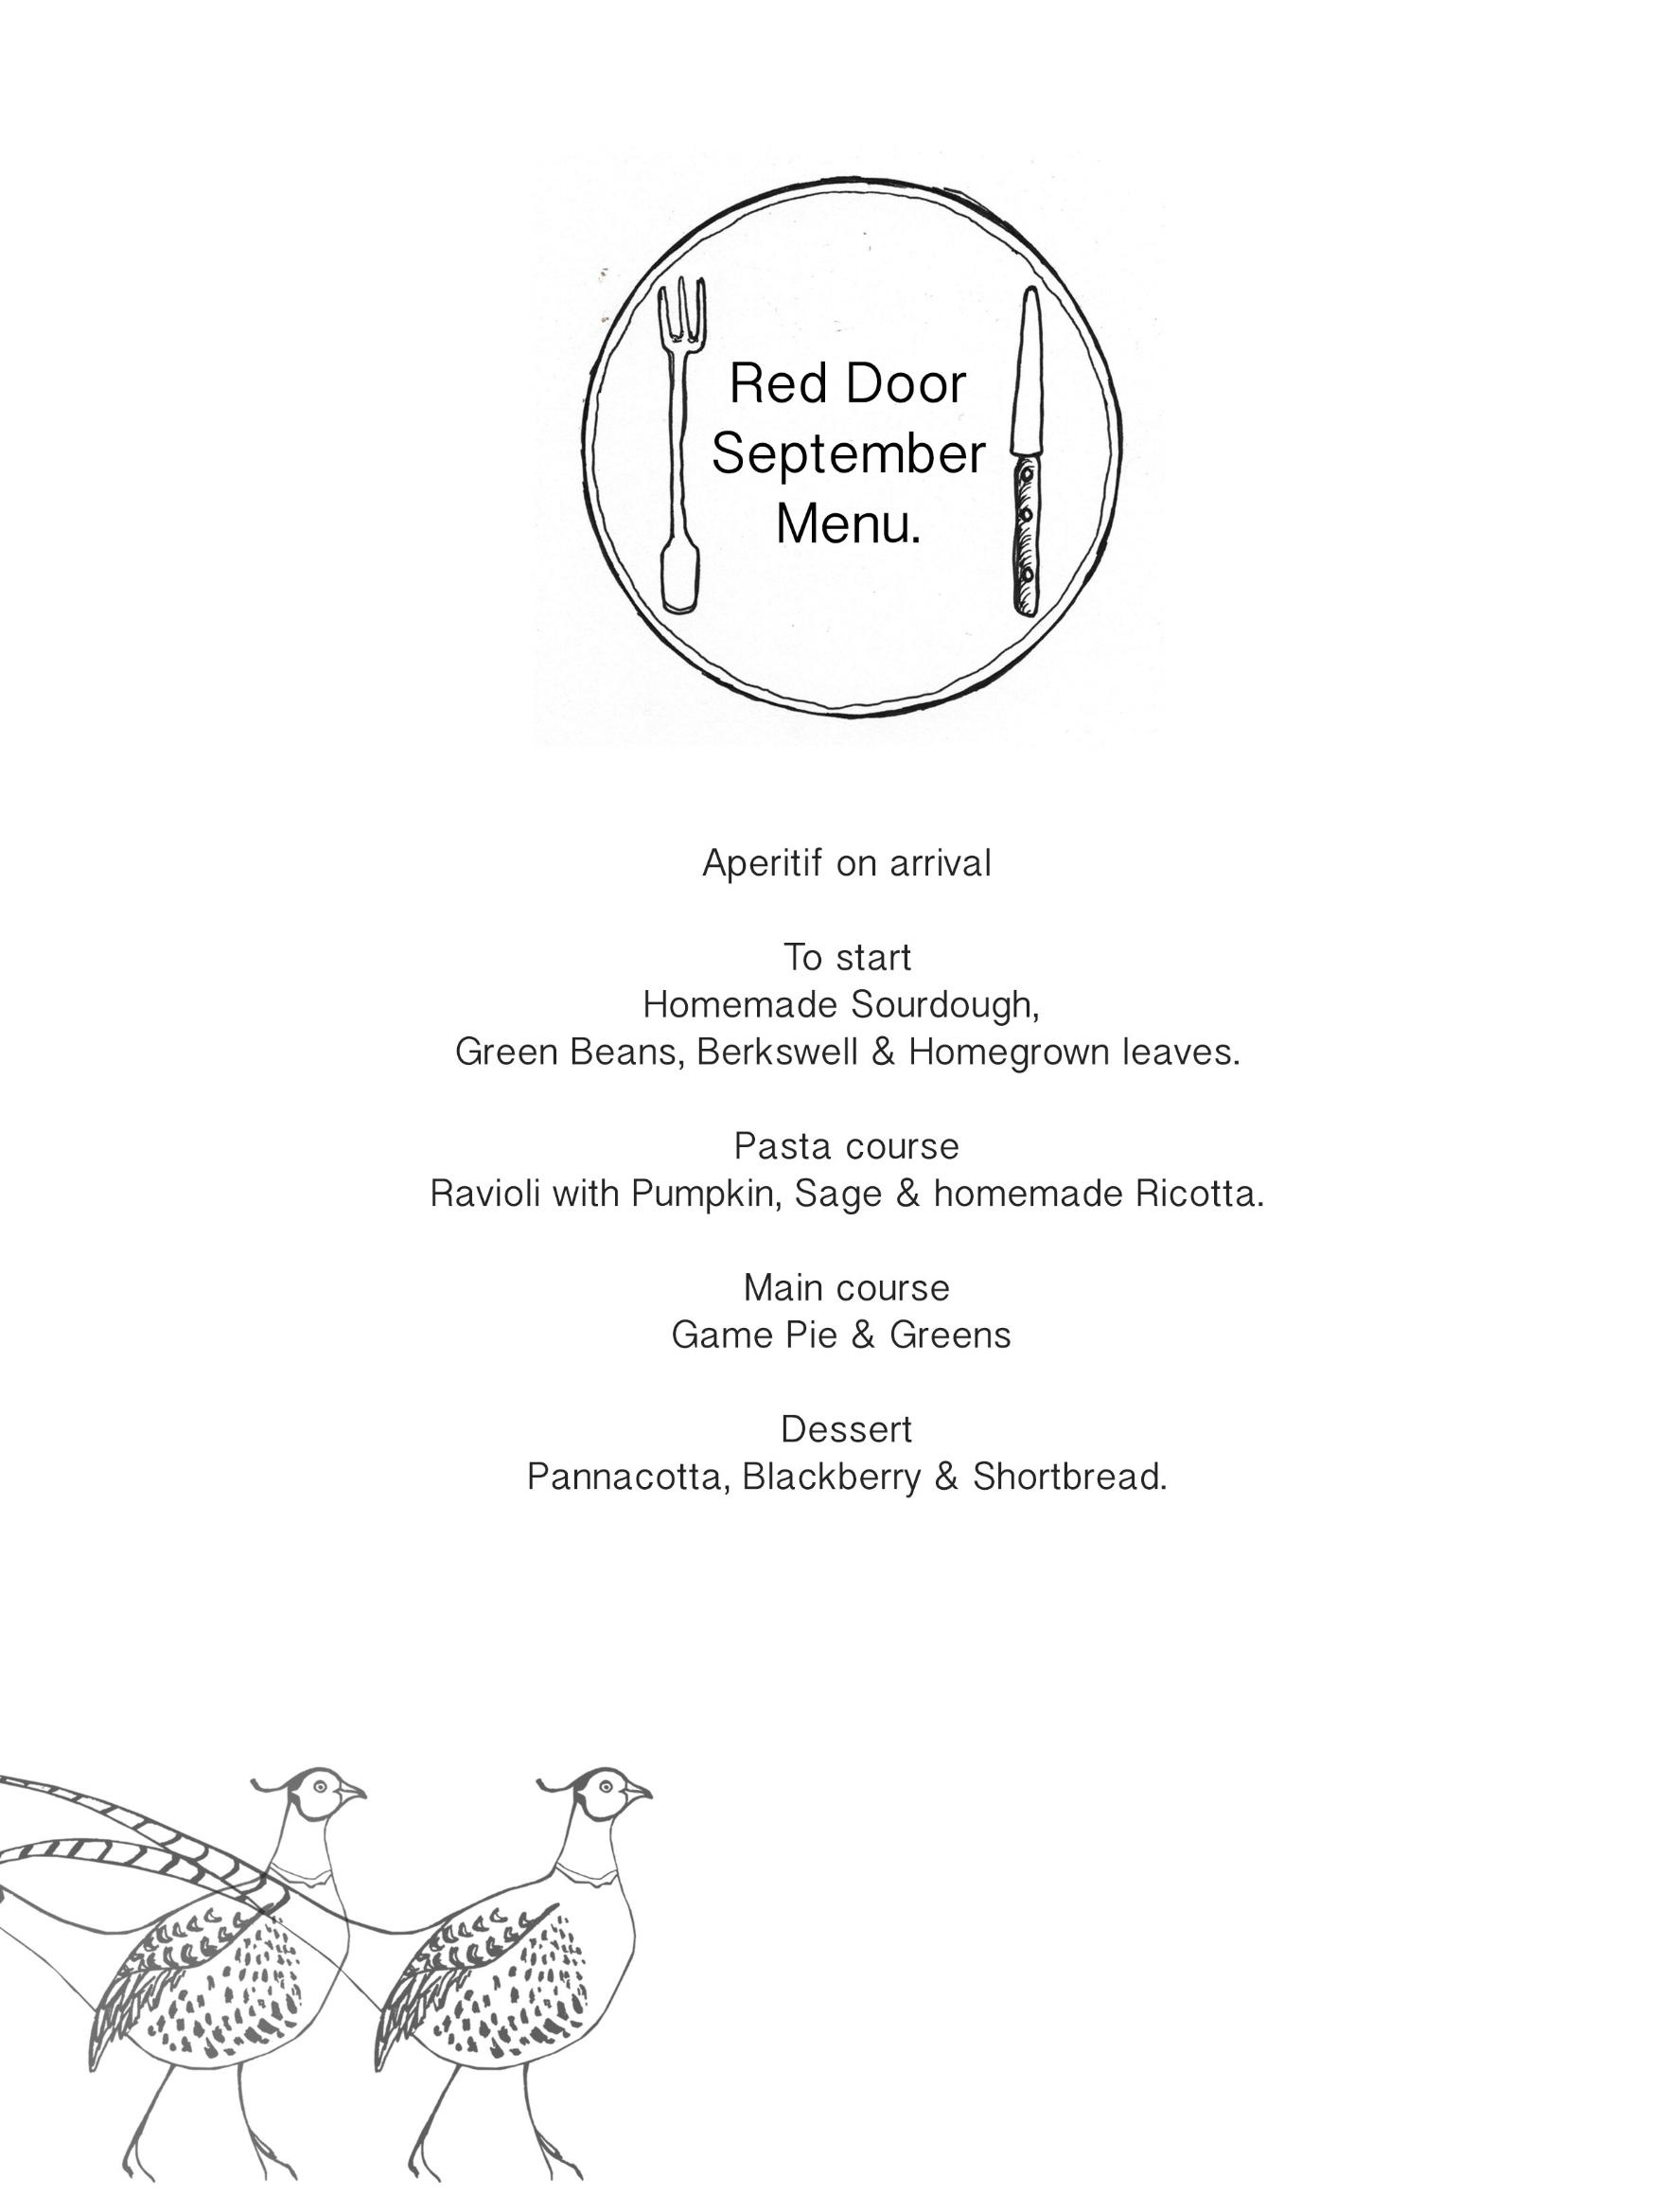 Red Door September menu.jpg